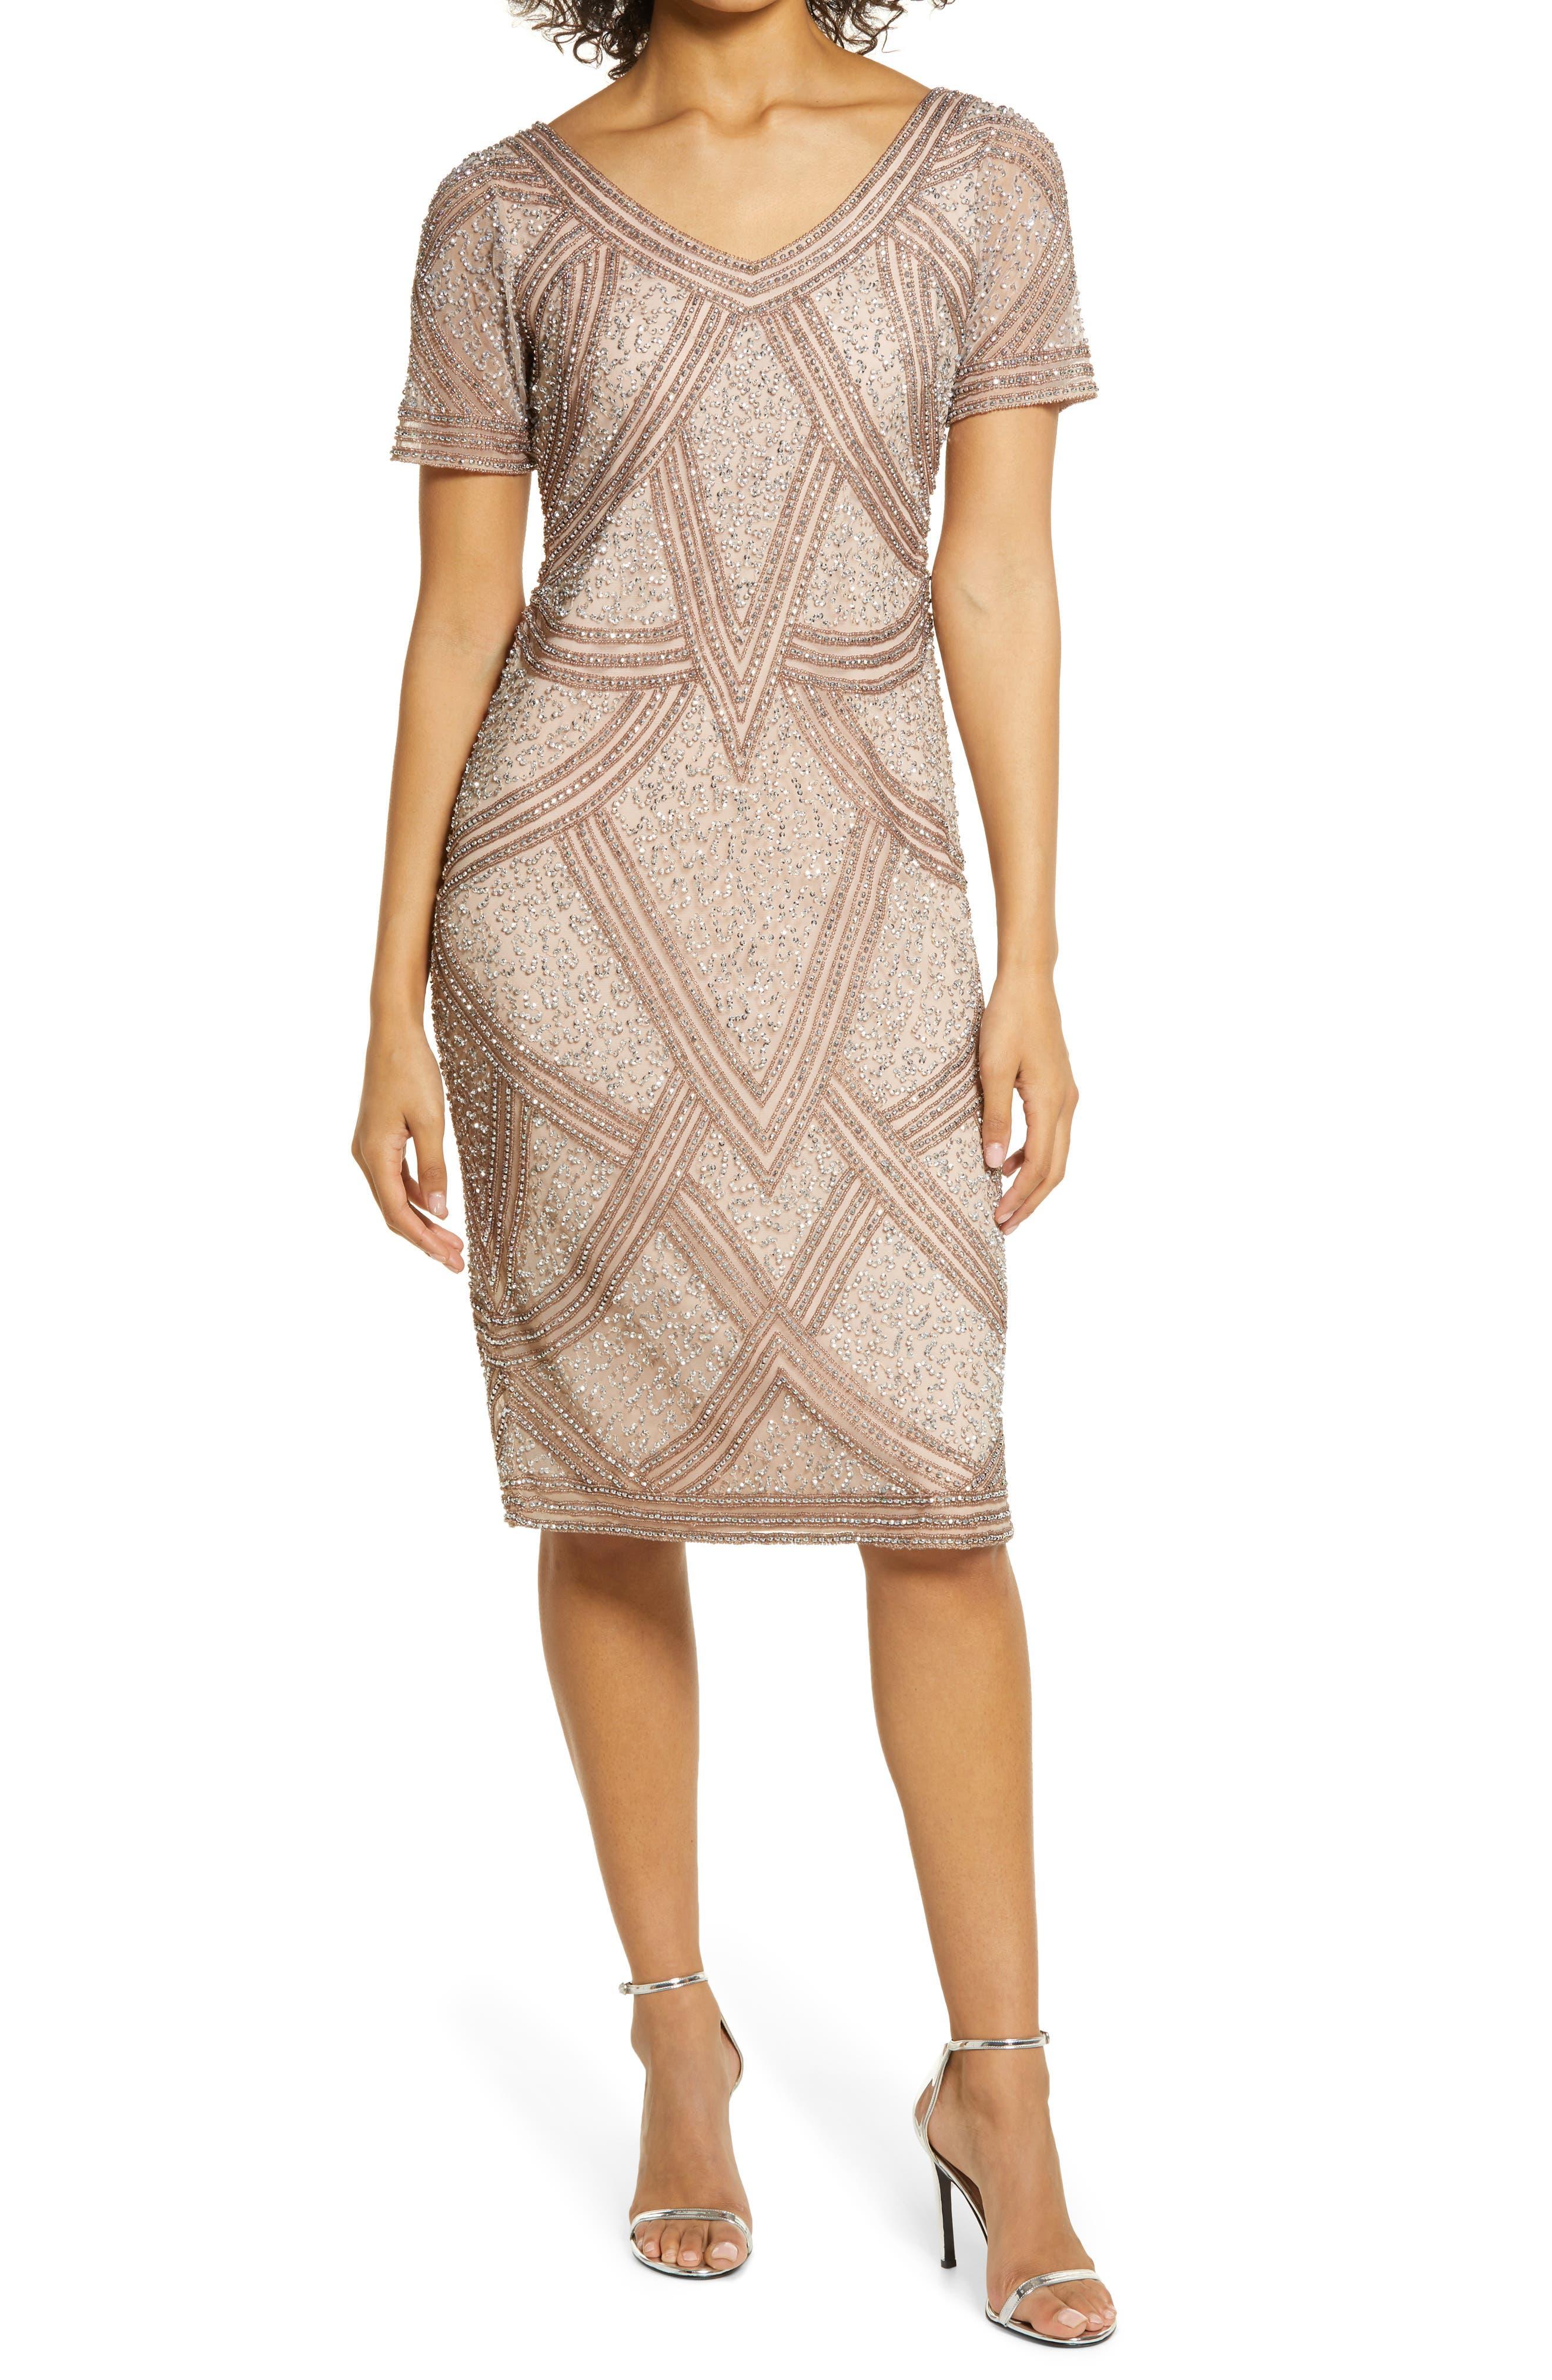 Great Gatsby Dress – Great Gatsby Dresses for Sale Womens Pisarro Nights Beaded Cocktail Sheath Midi Dress Size 18 - Pink $228.00 AT vintagedancer.com